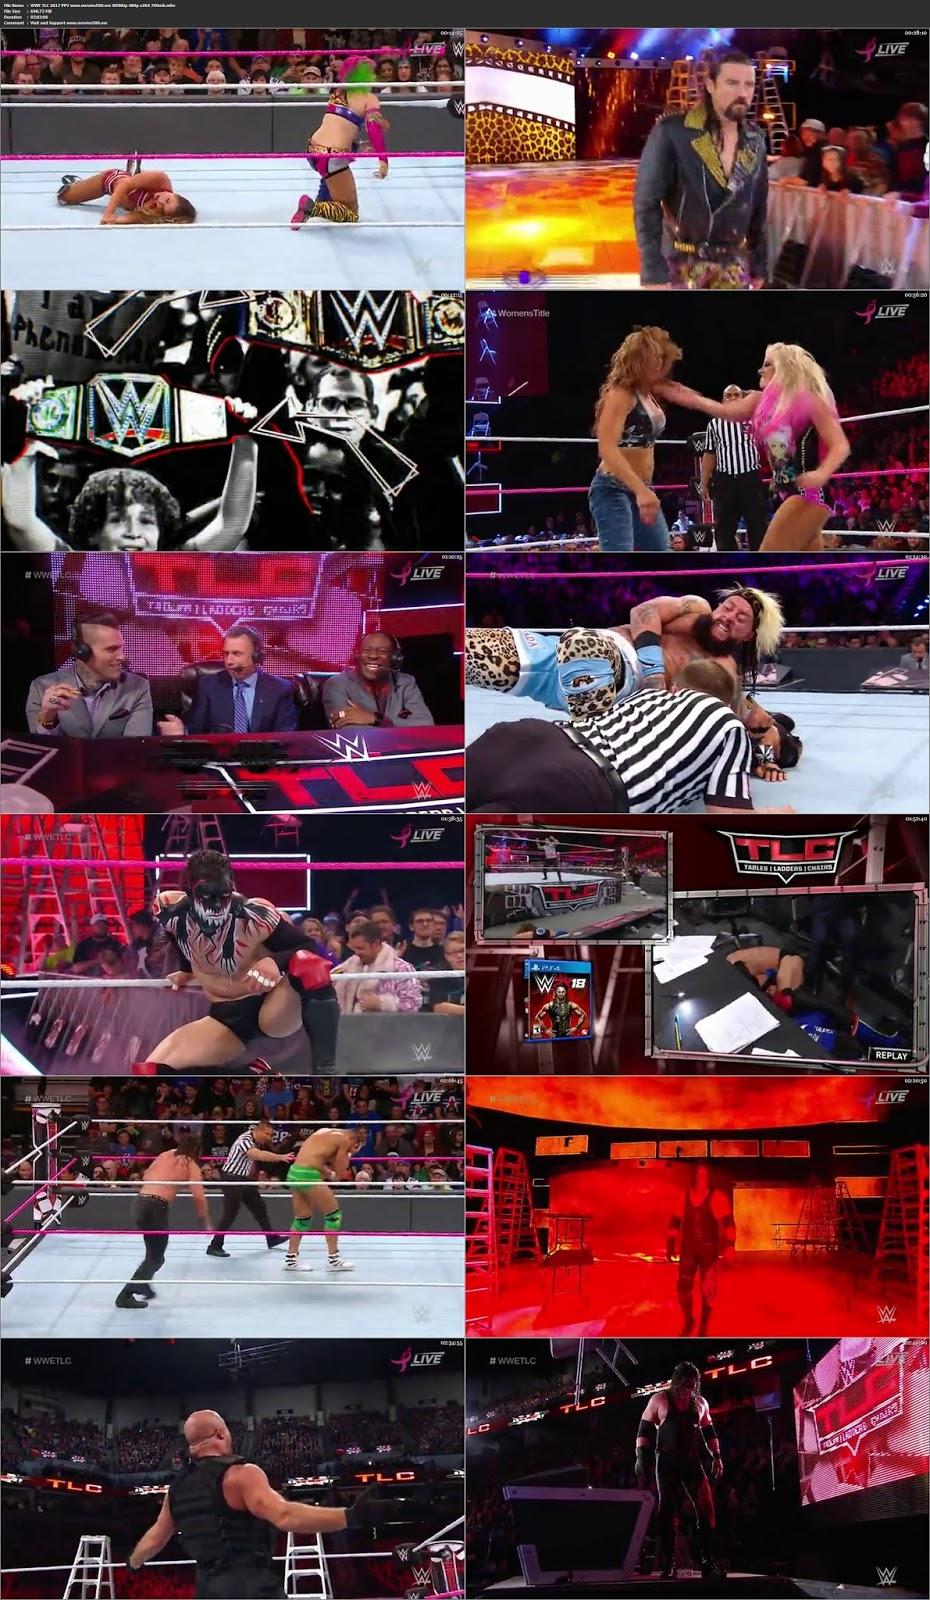 WWE TLC 2017 Full Wrestling Show WEBRip 480p at movies500.me